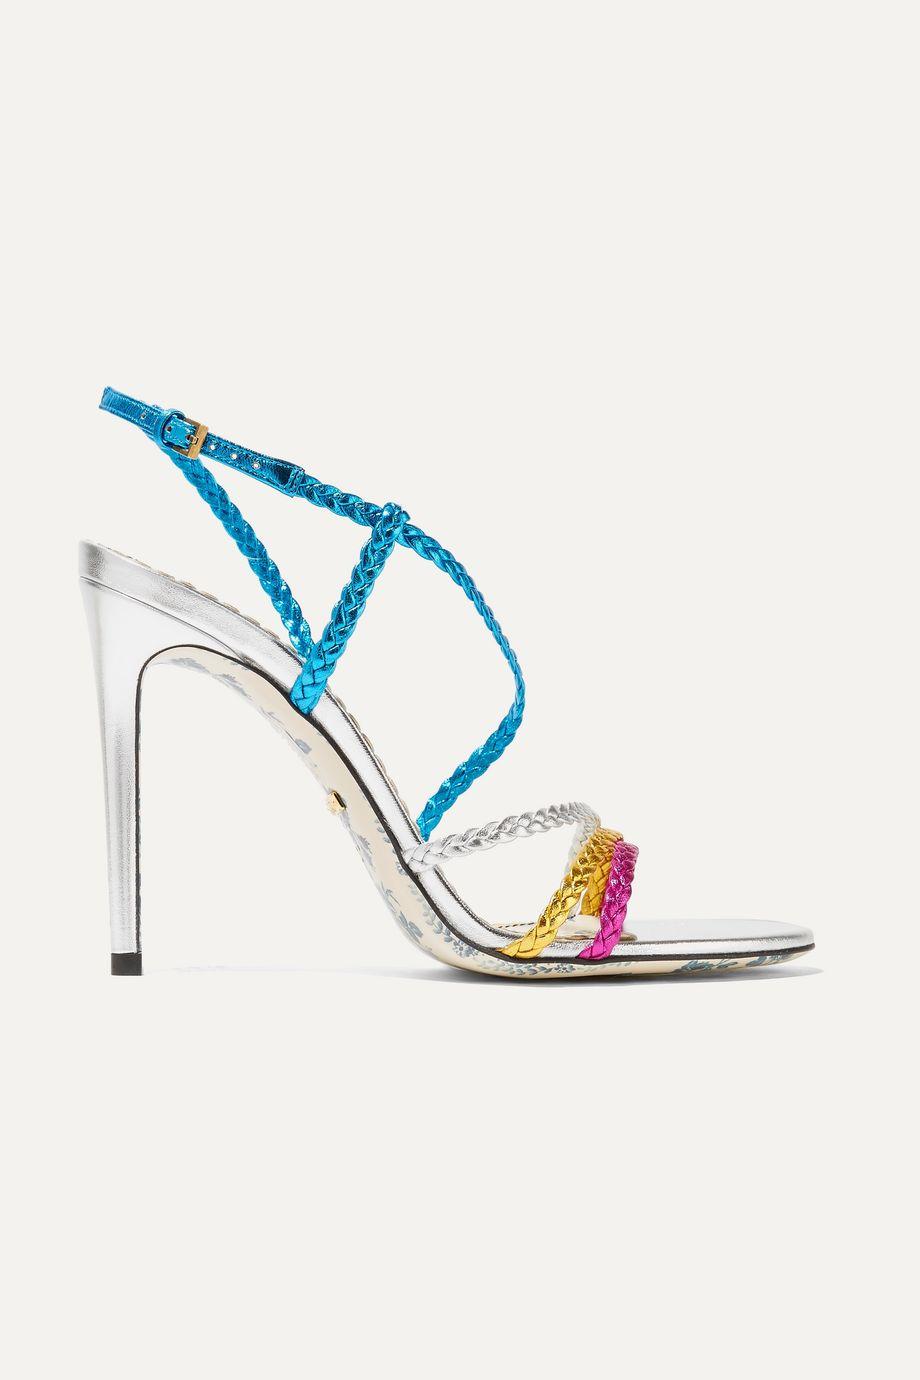 Gucci Braided metallic leather slingback sandals